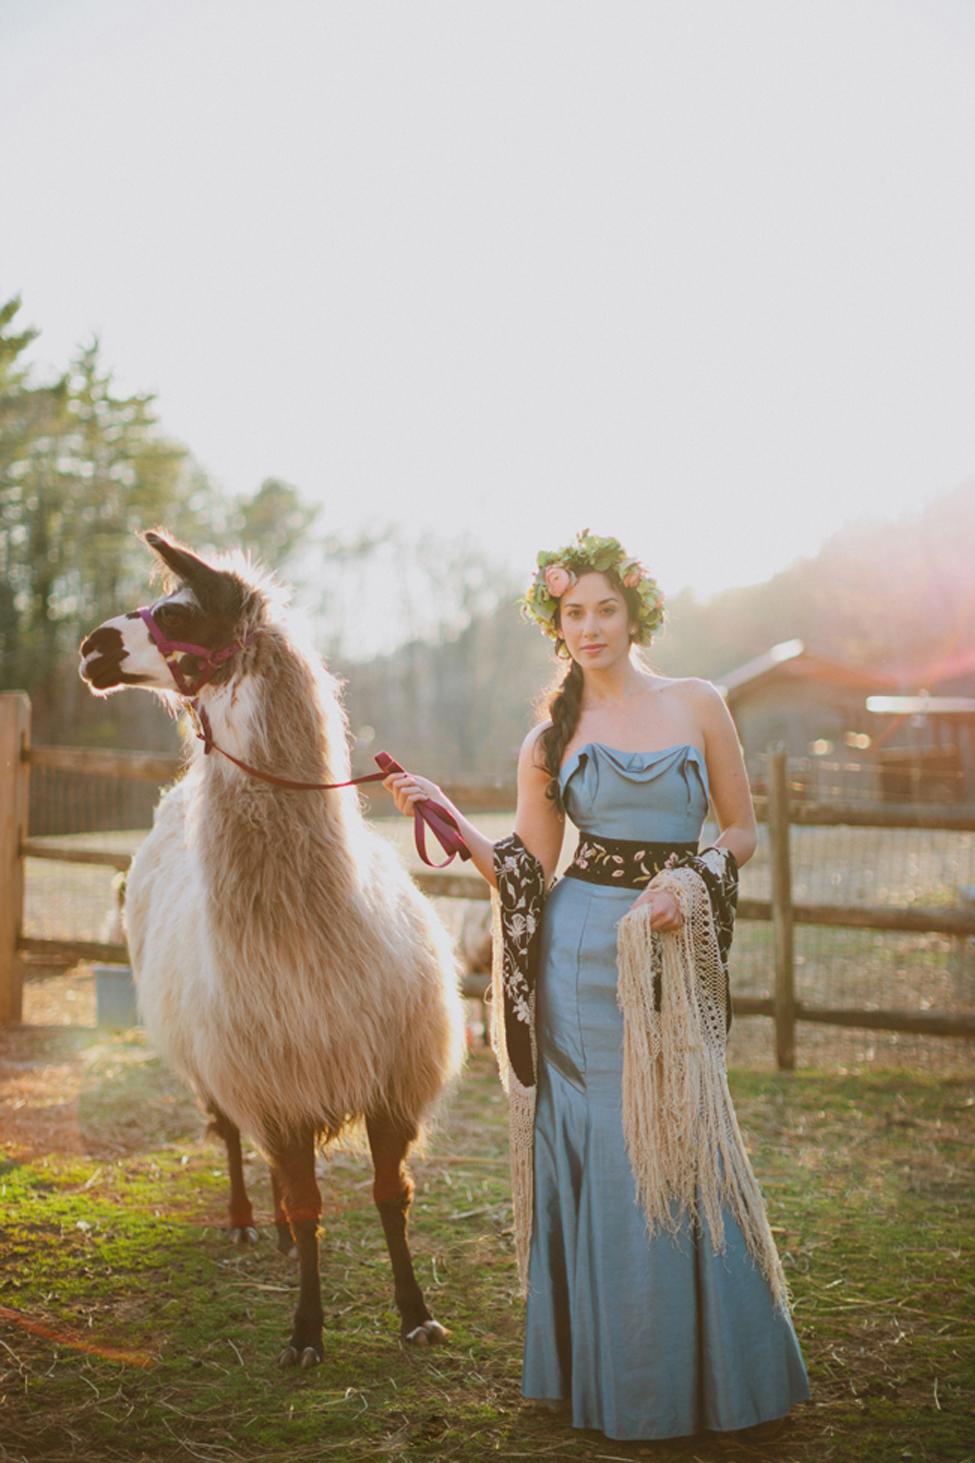 jameykay_arlie_folk_farm_wedding076.jpg